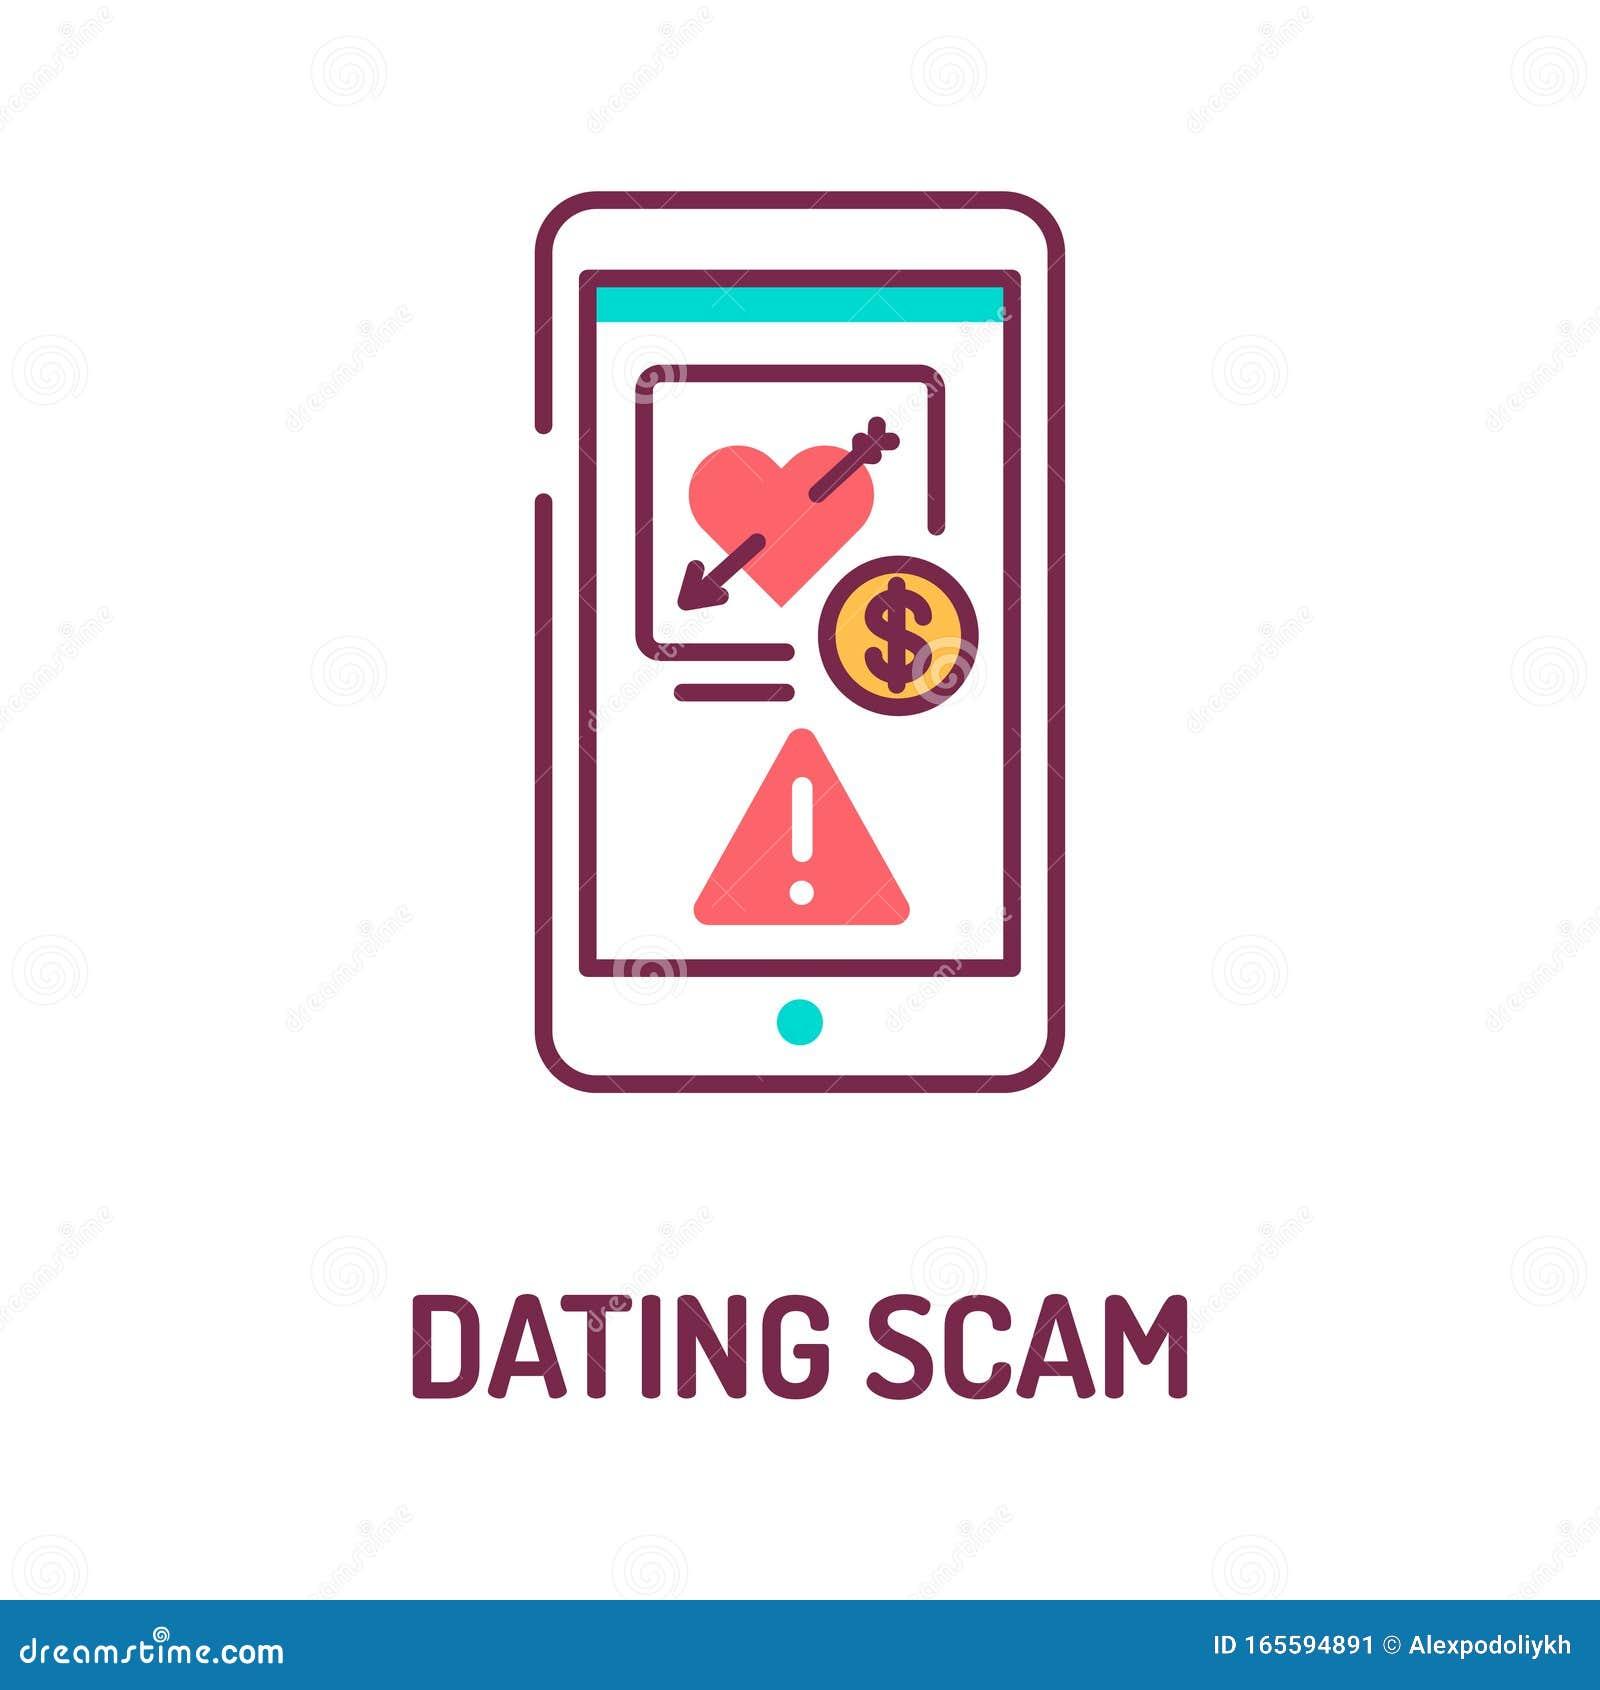 passion dating login